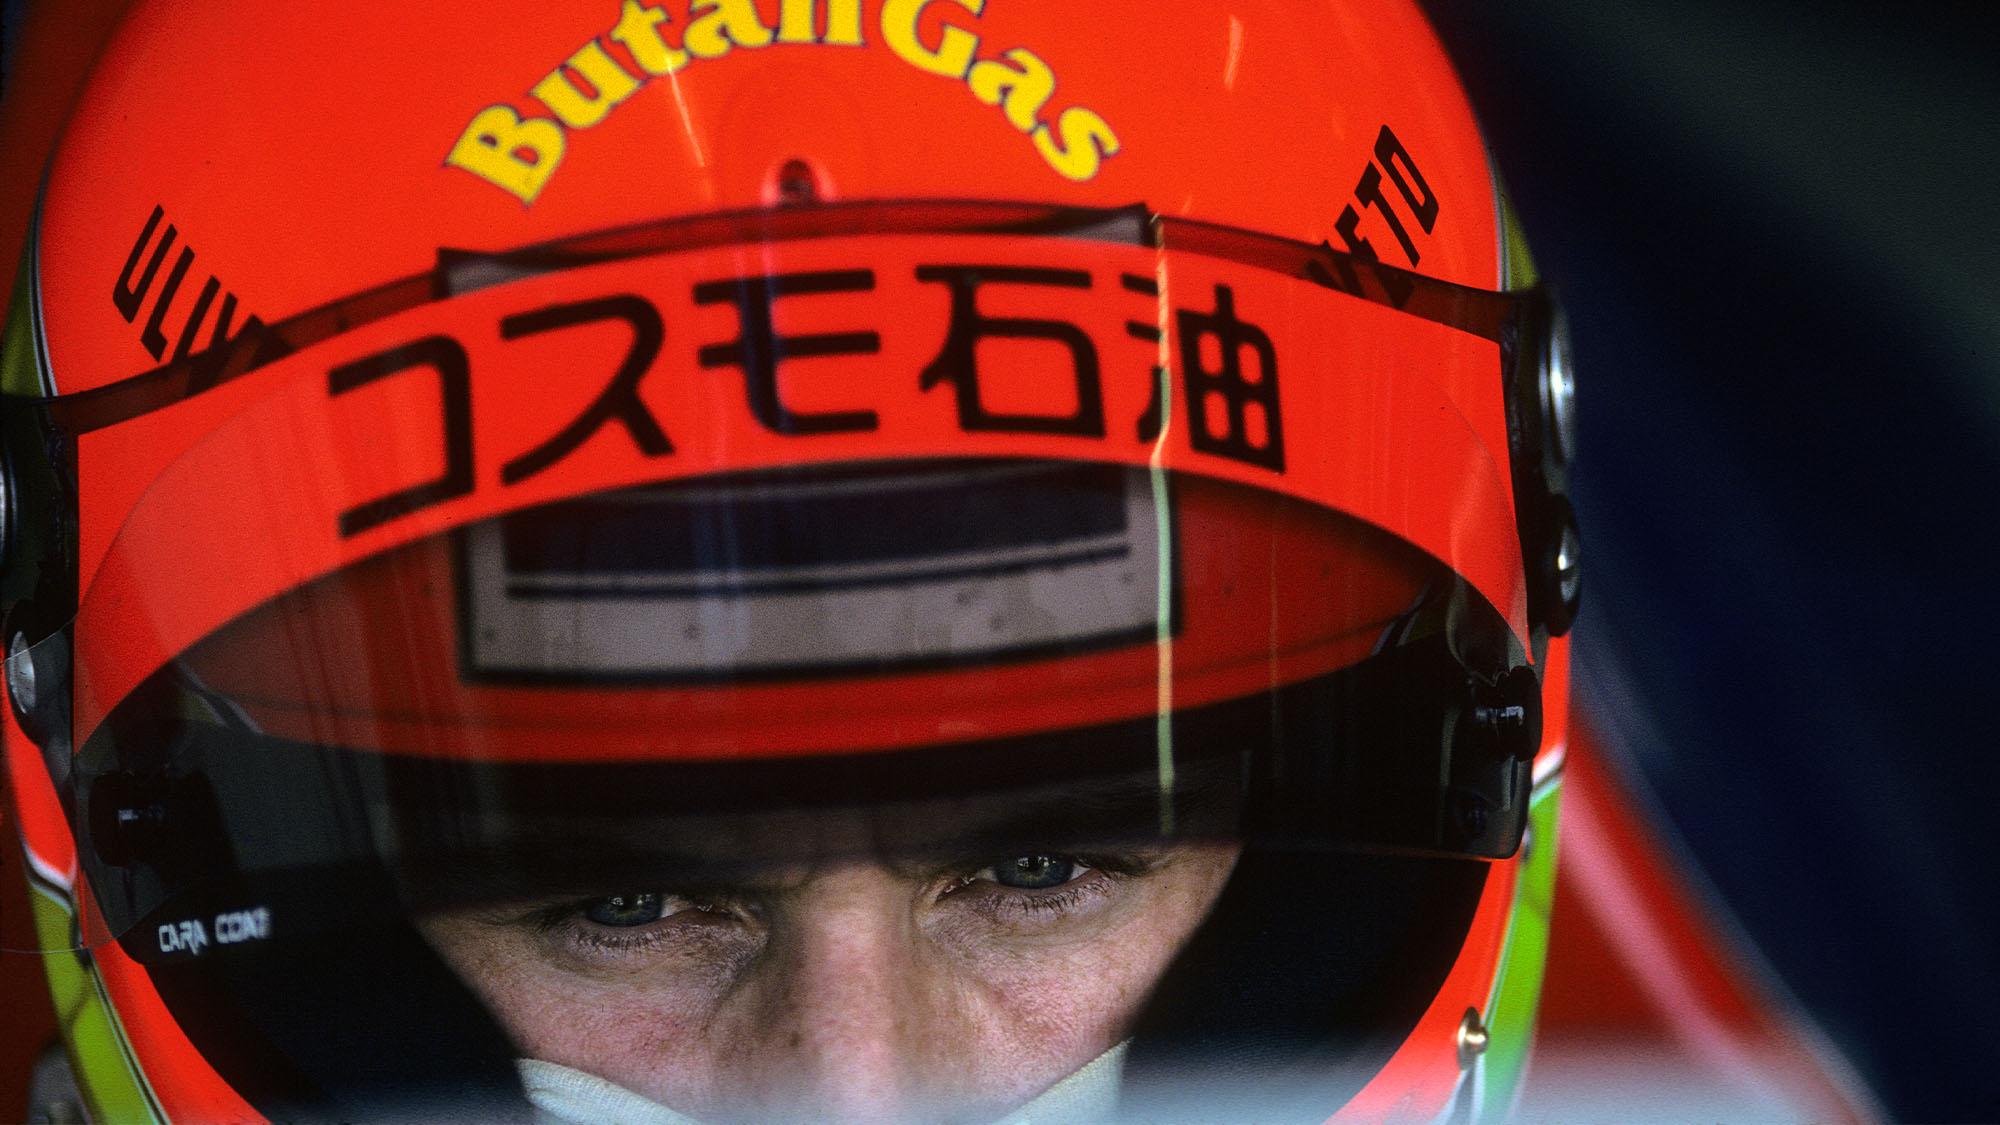 Eddie Irvine, Jordan-Hart 193, Grand Prix of Japan, Suzuka Circuit, 24 October 1993. (Photo by Paul-Henri Cahier/Getty Images)